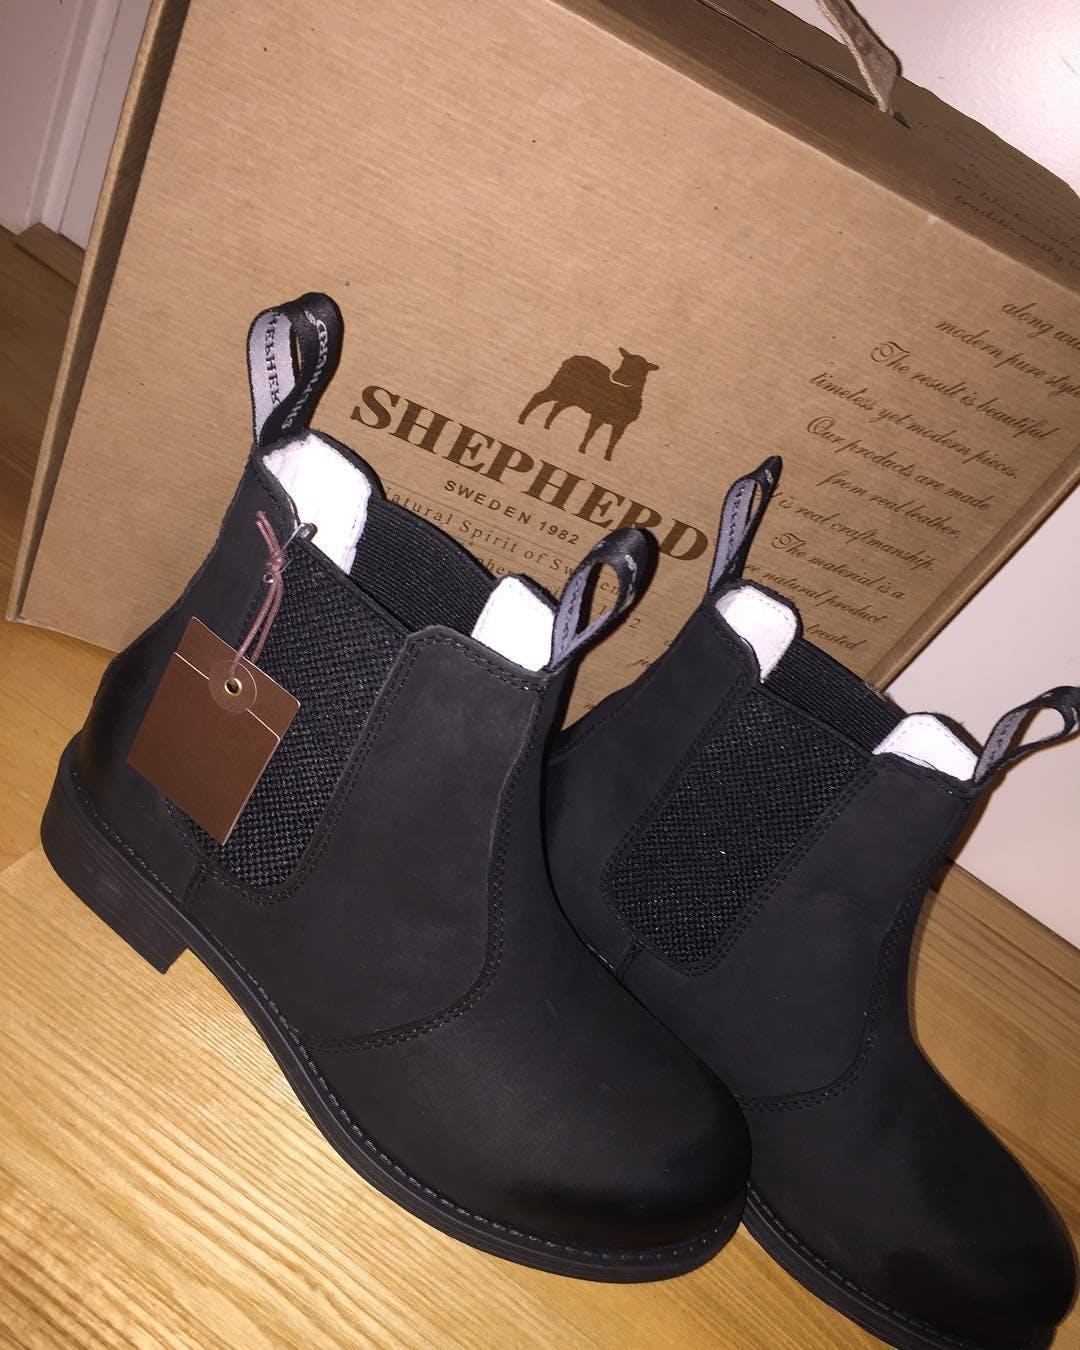 Shepherd, Schuhe Europas herrlichstes Schuhsortiment